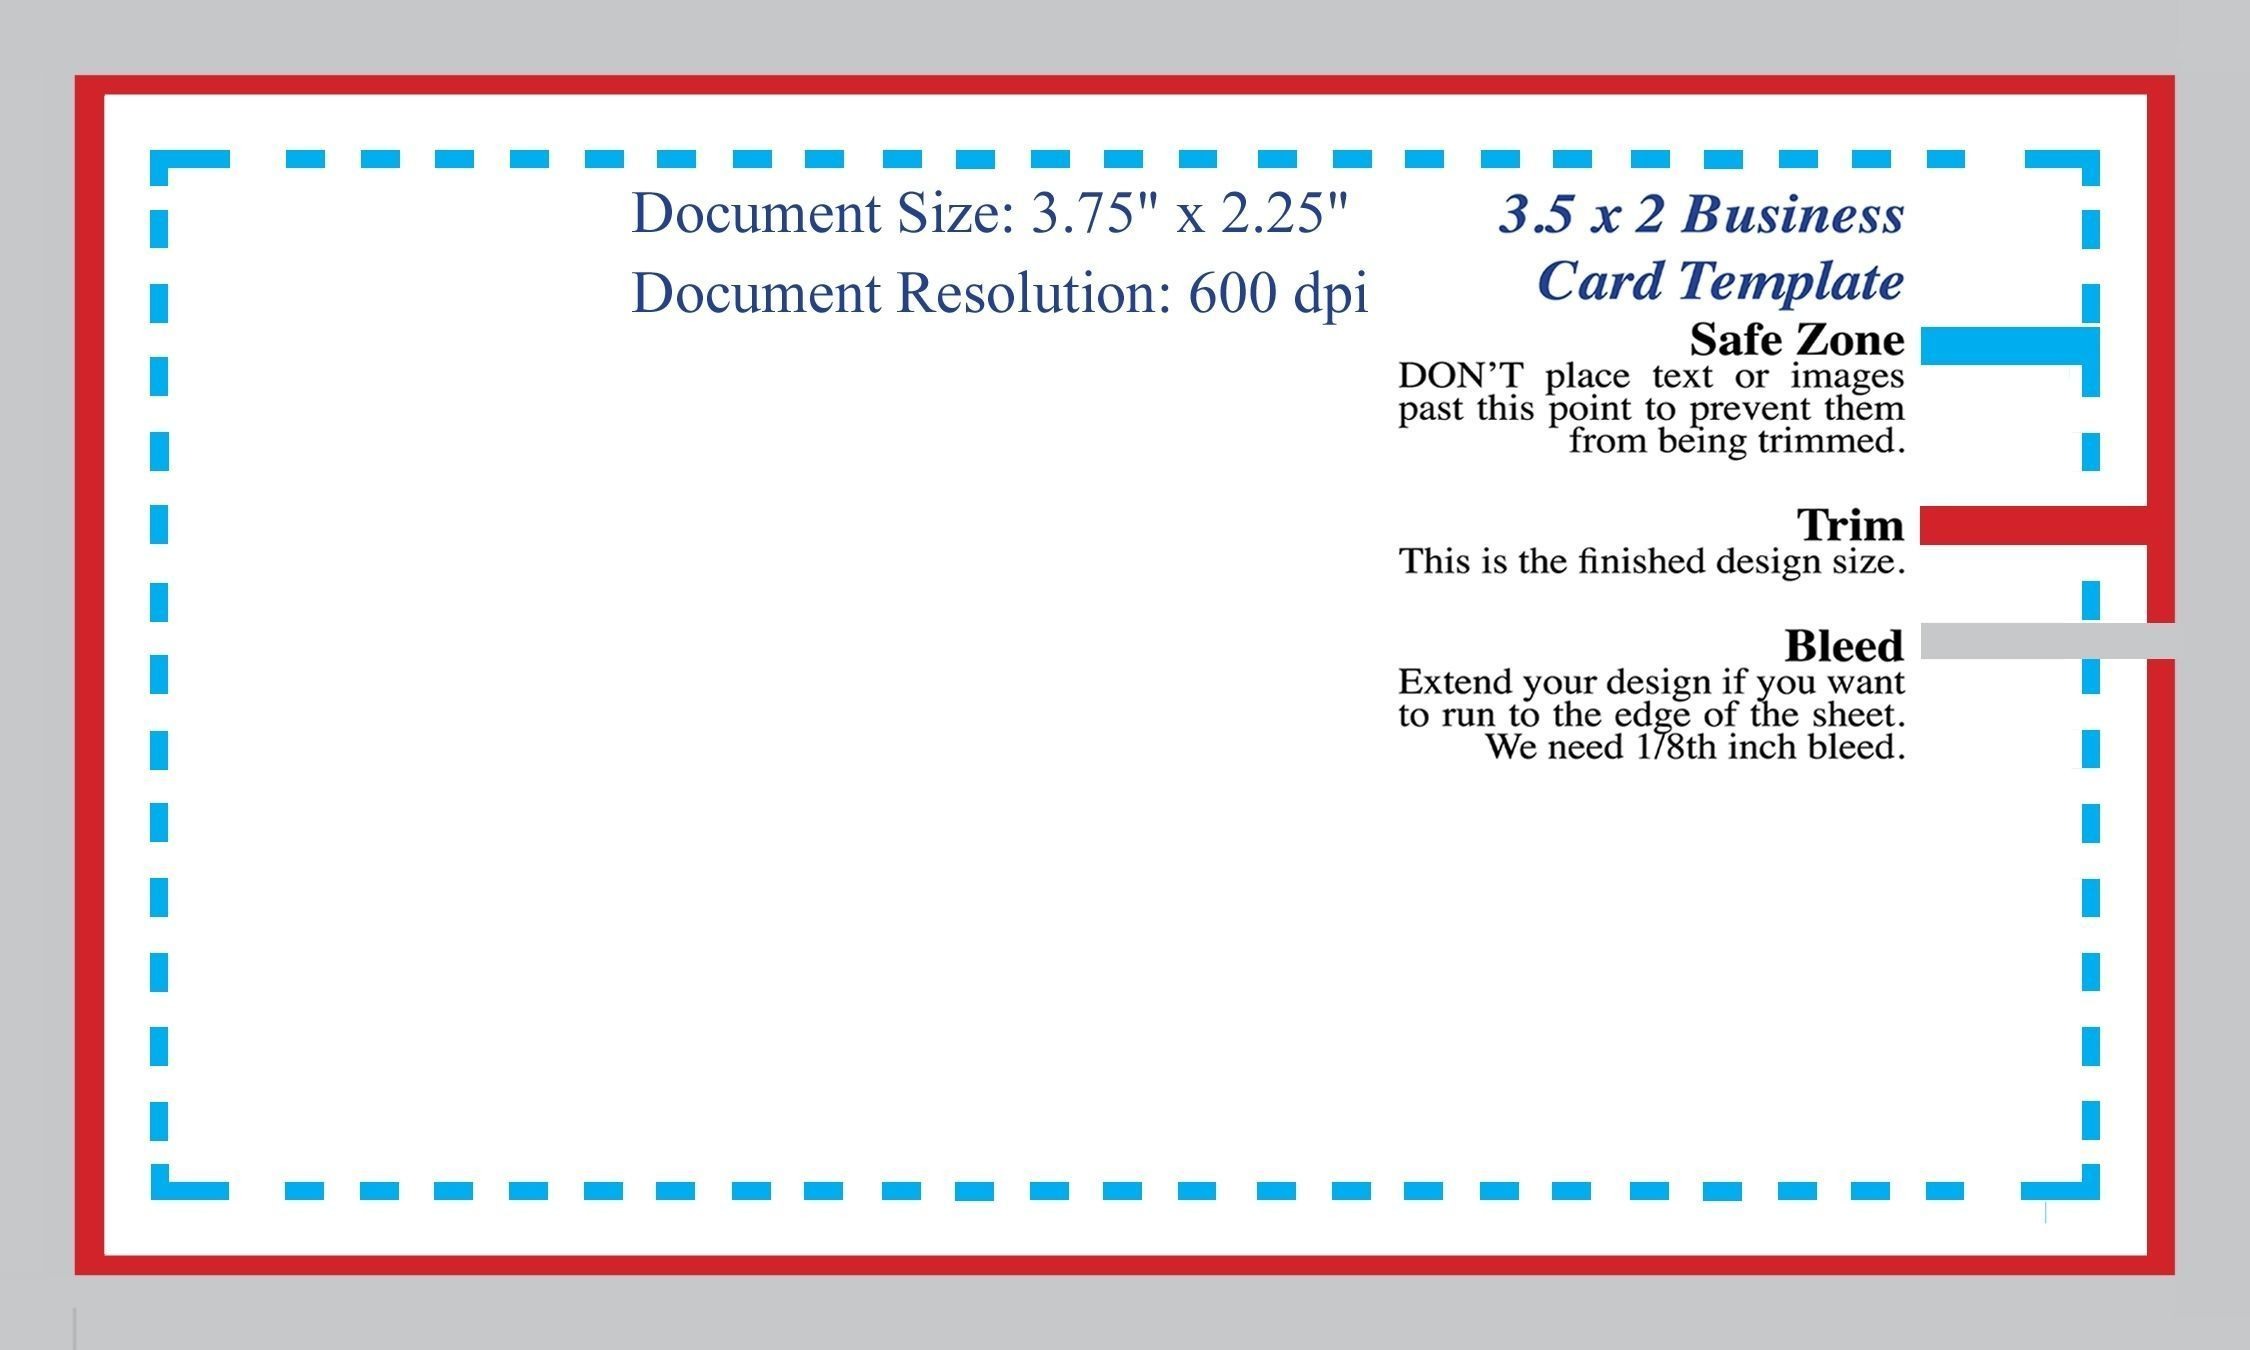 Standard Business Card Blank Template Photoshop Template Pertaining T Business Card Template Word Business Card Template Photoshop Free Business Card Templates